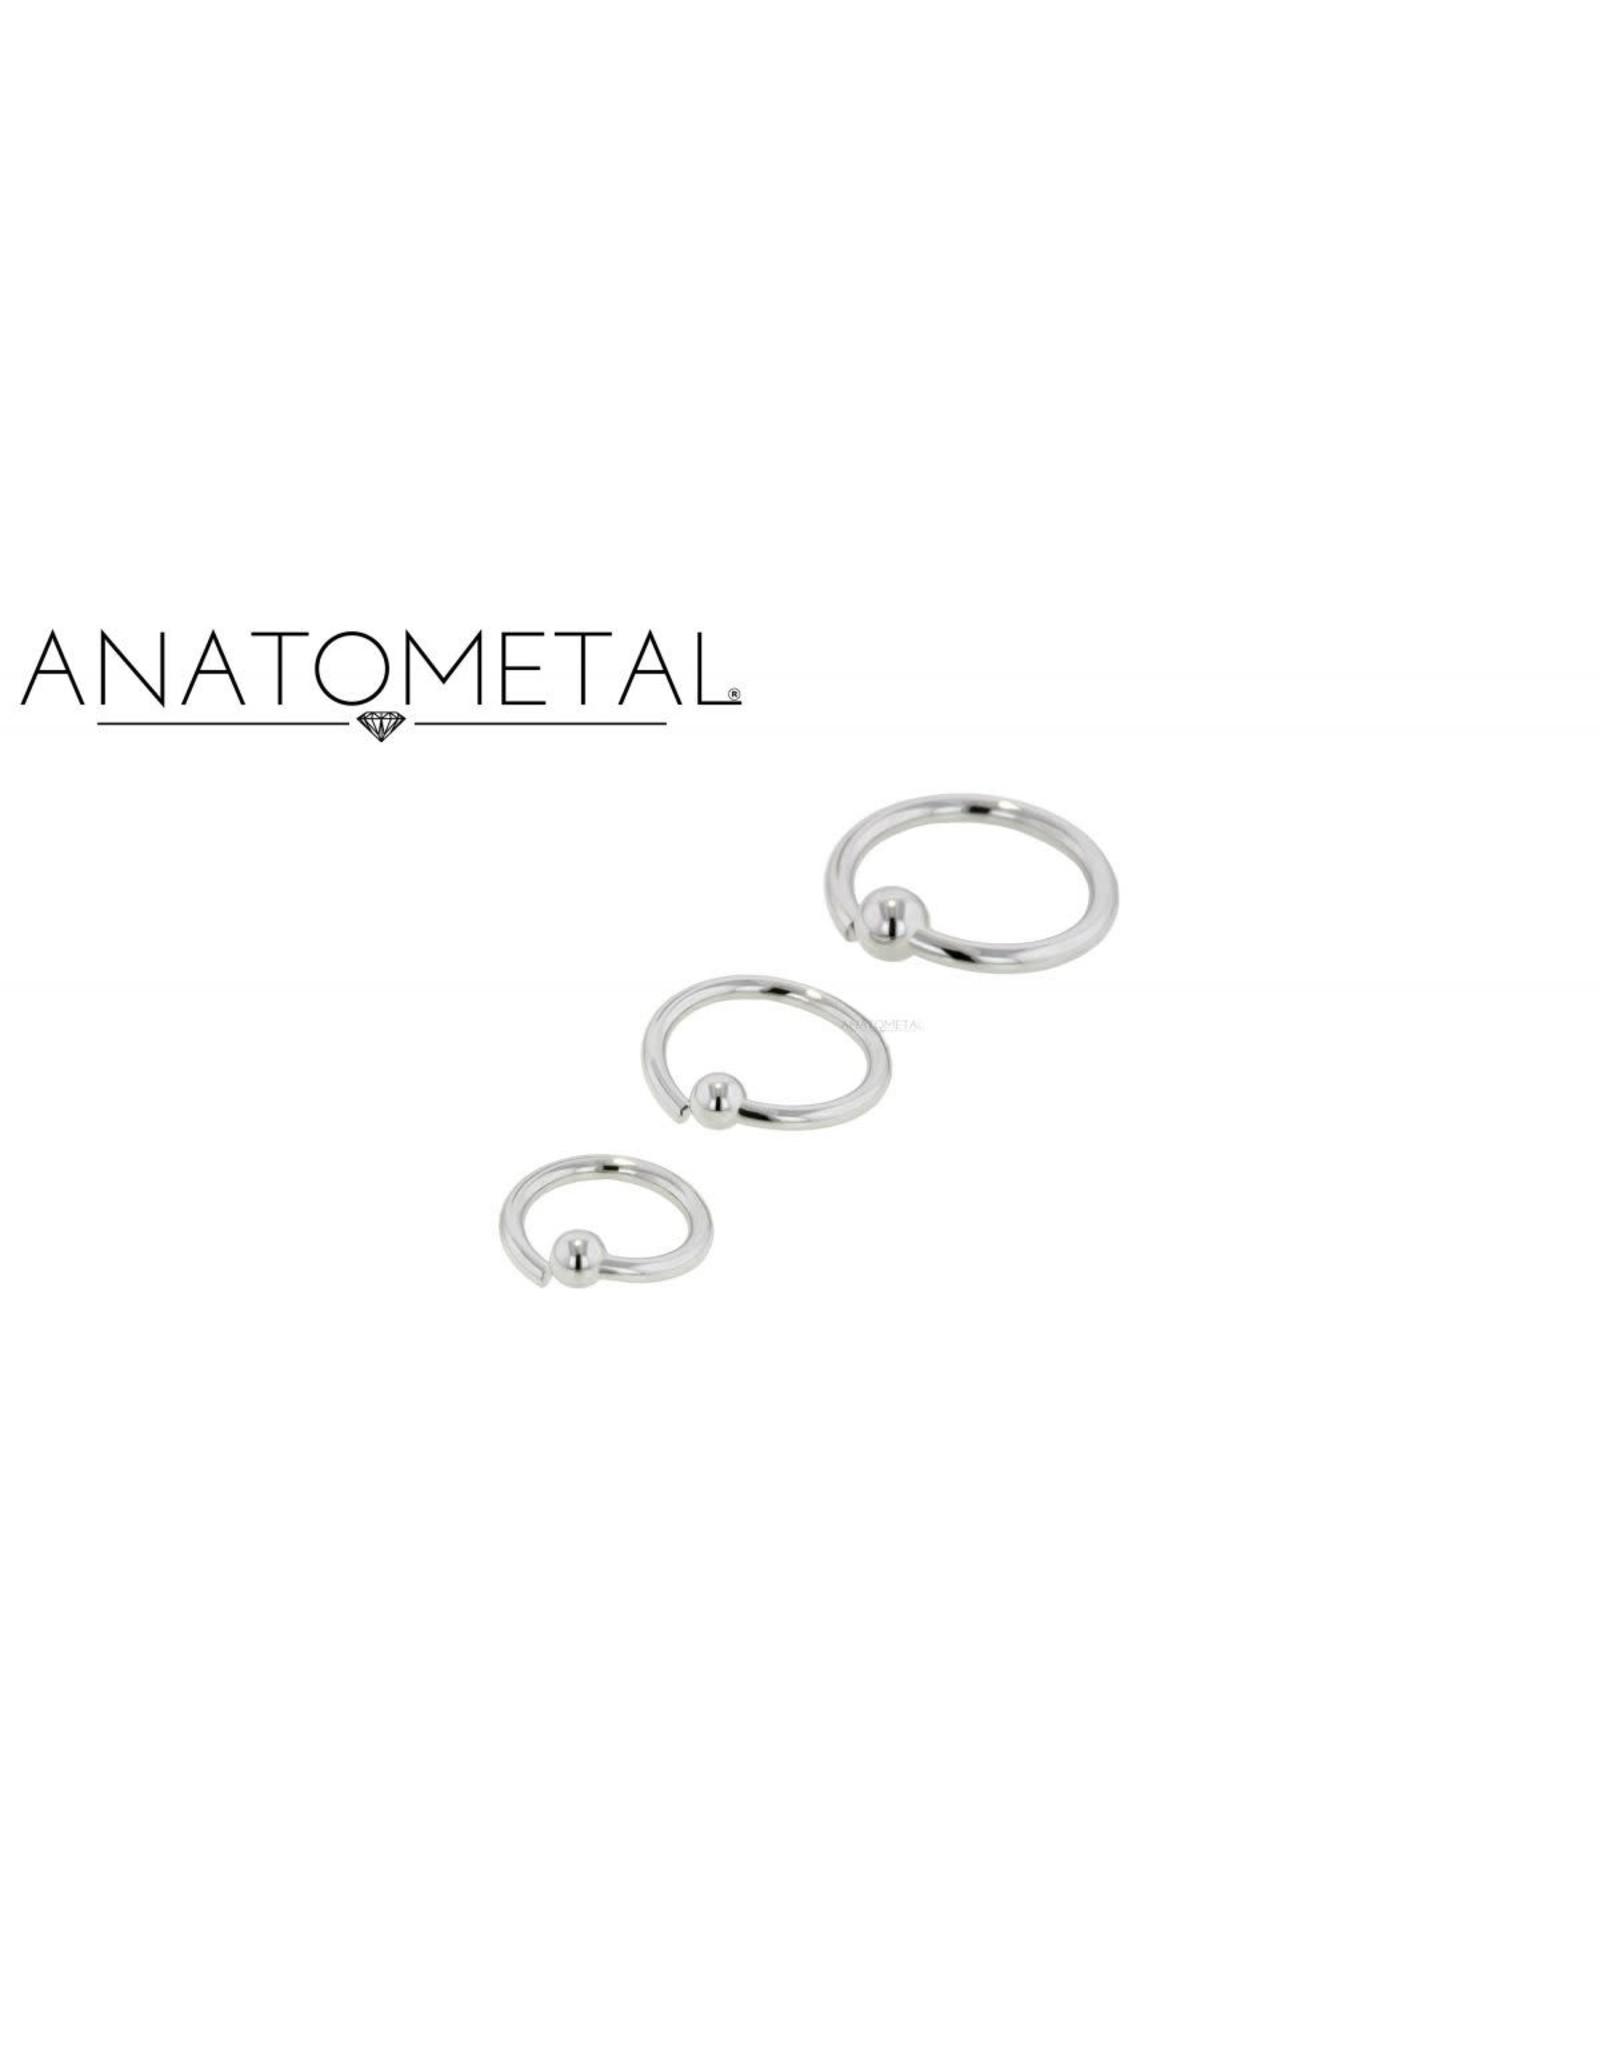 Anatometal Anatometal 16g Steel Fixed Bead Ring